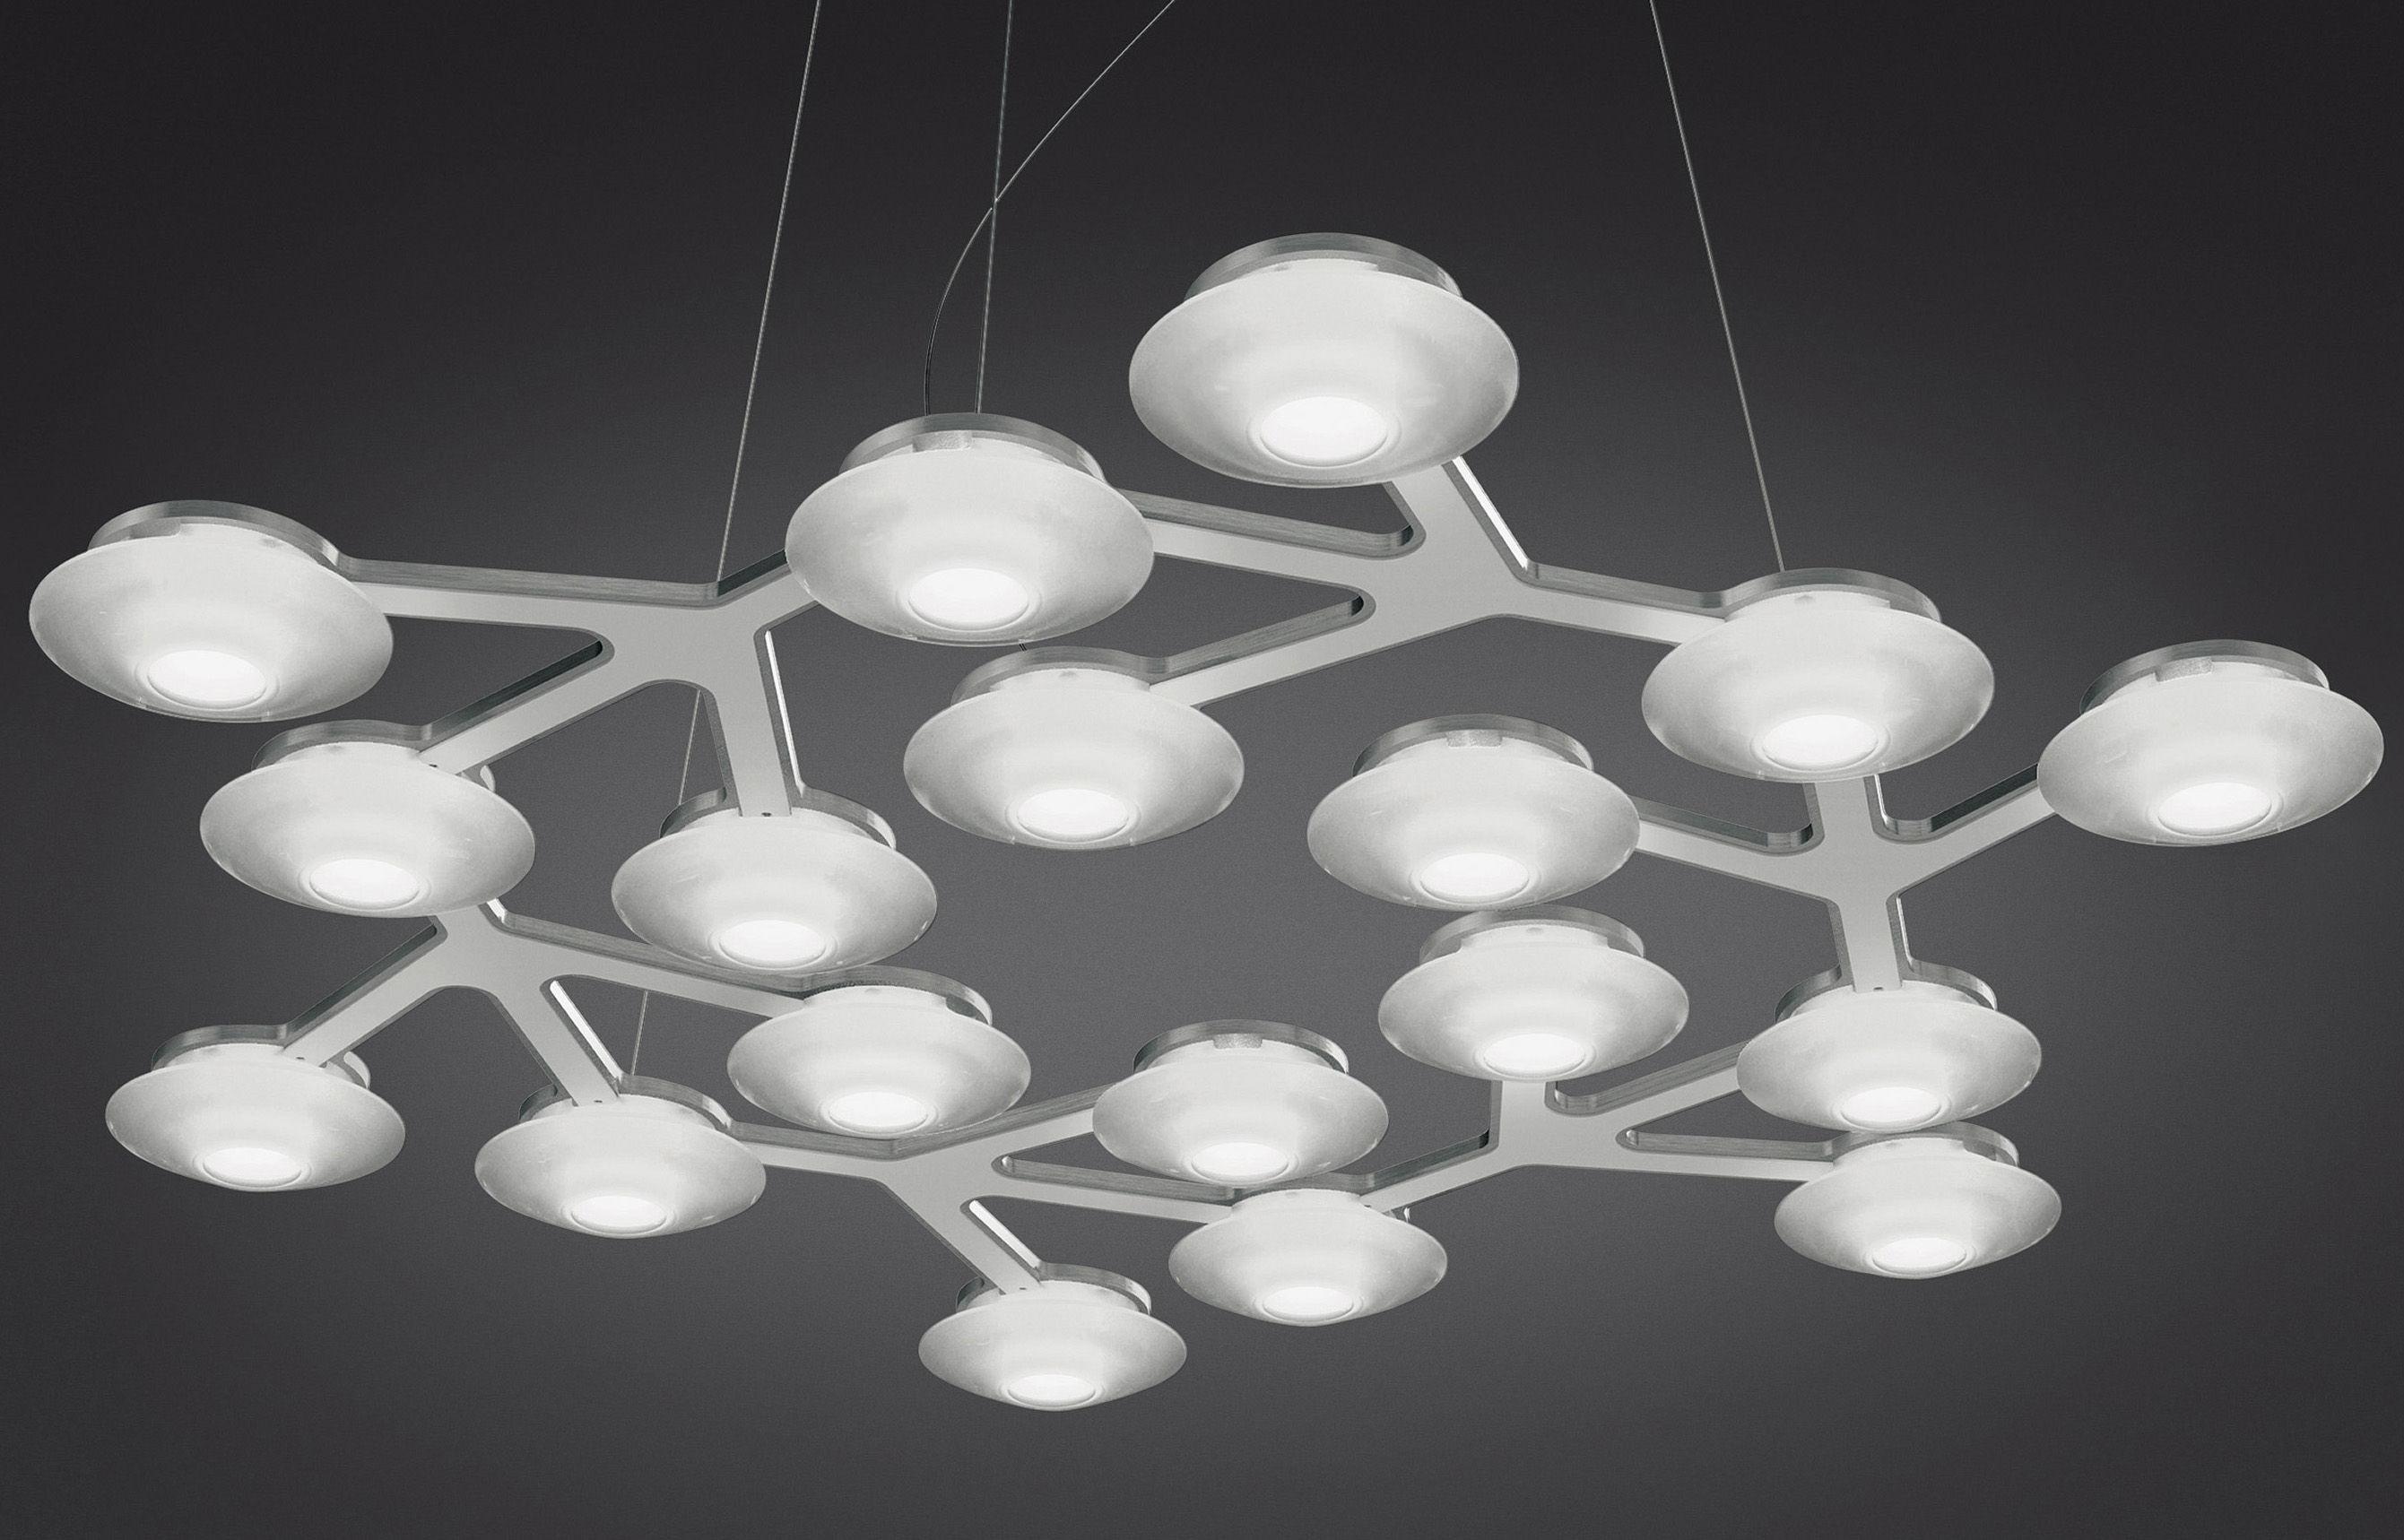 Lighting - Pendant Lighting - LED NET Pendant - Round- Ø 65 cm by Artemide - White - Methacrylate, Painted aluminium